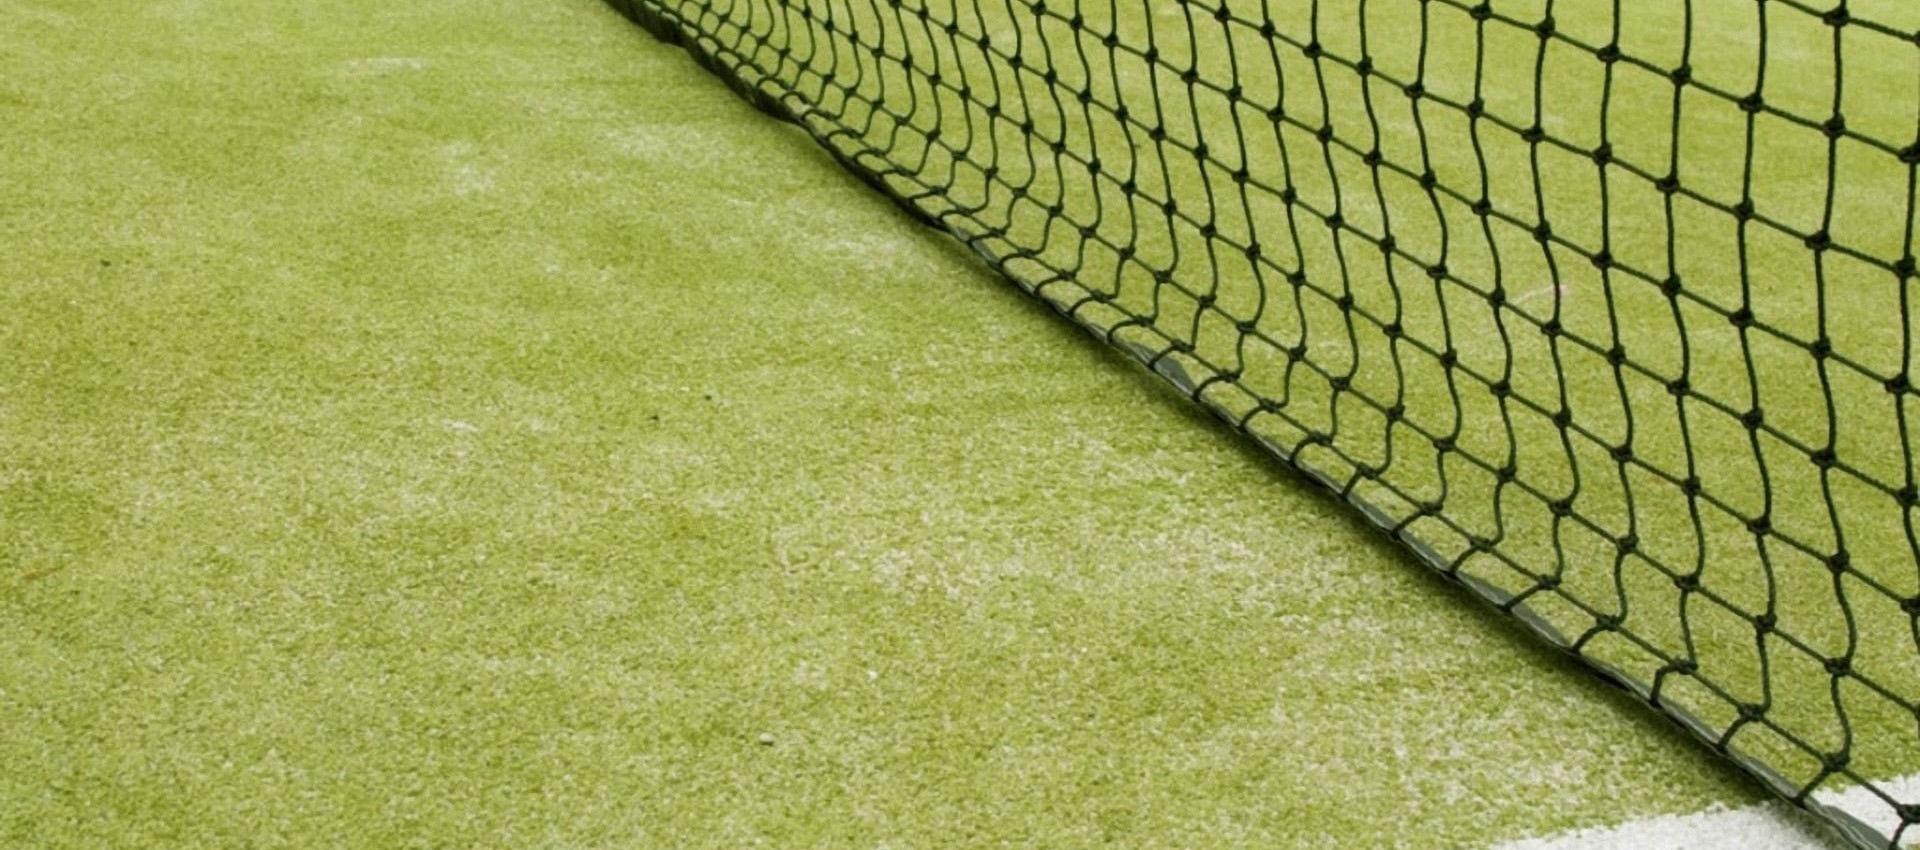 Tennis landing 3330ee9e6ed96337811fbaa82bf6842703dad8f1549efa151e54b6e56efbff6b